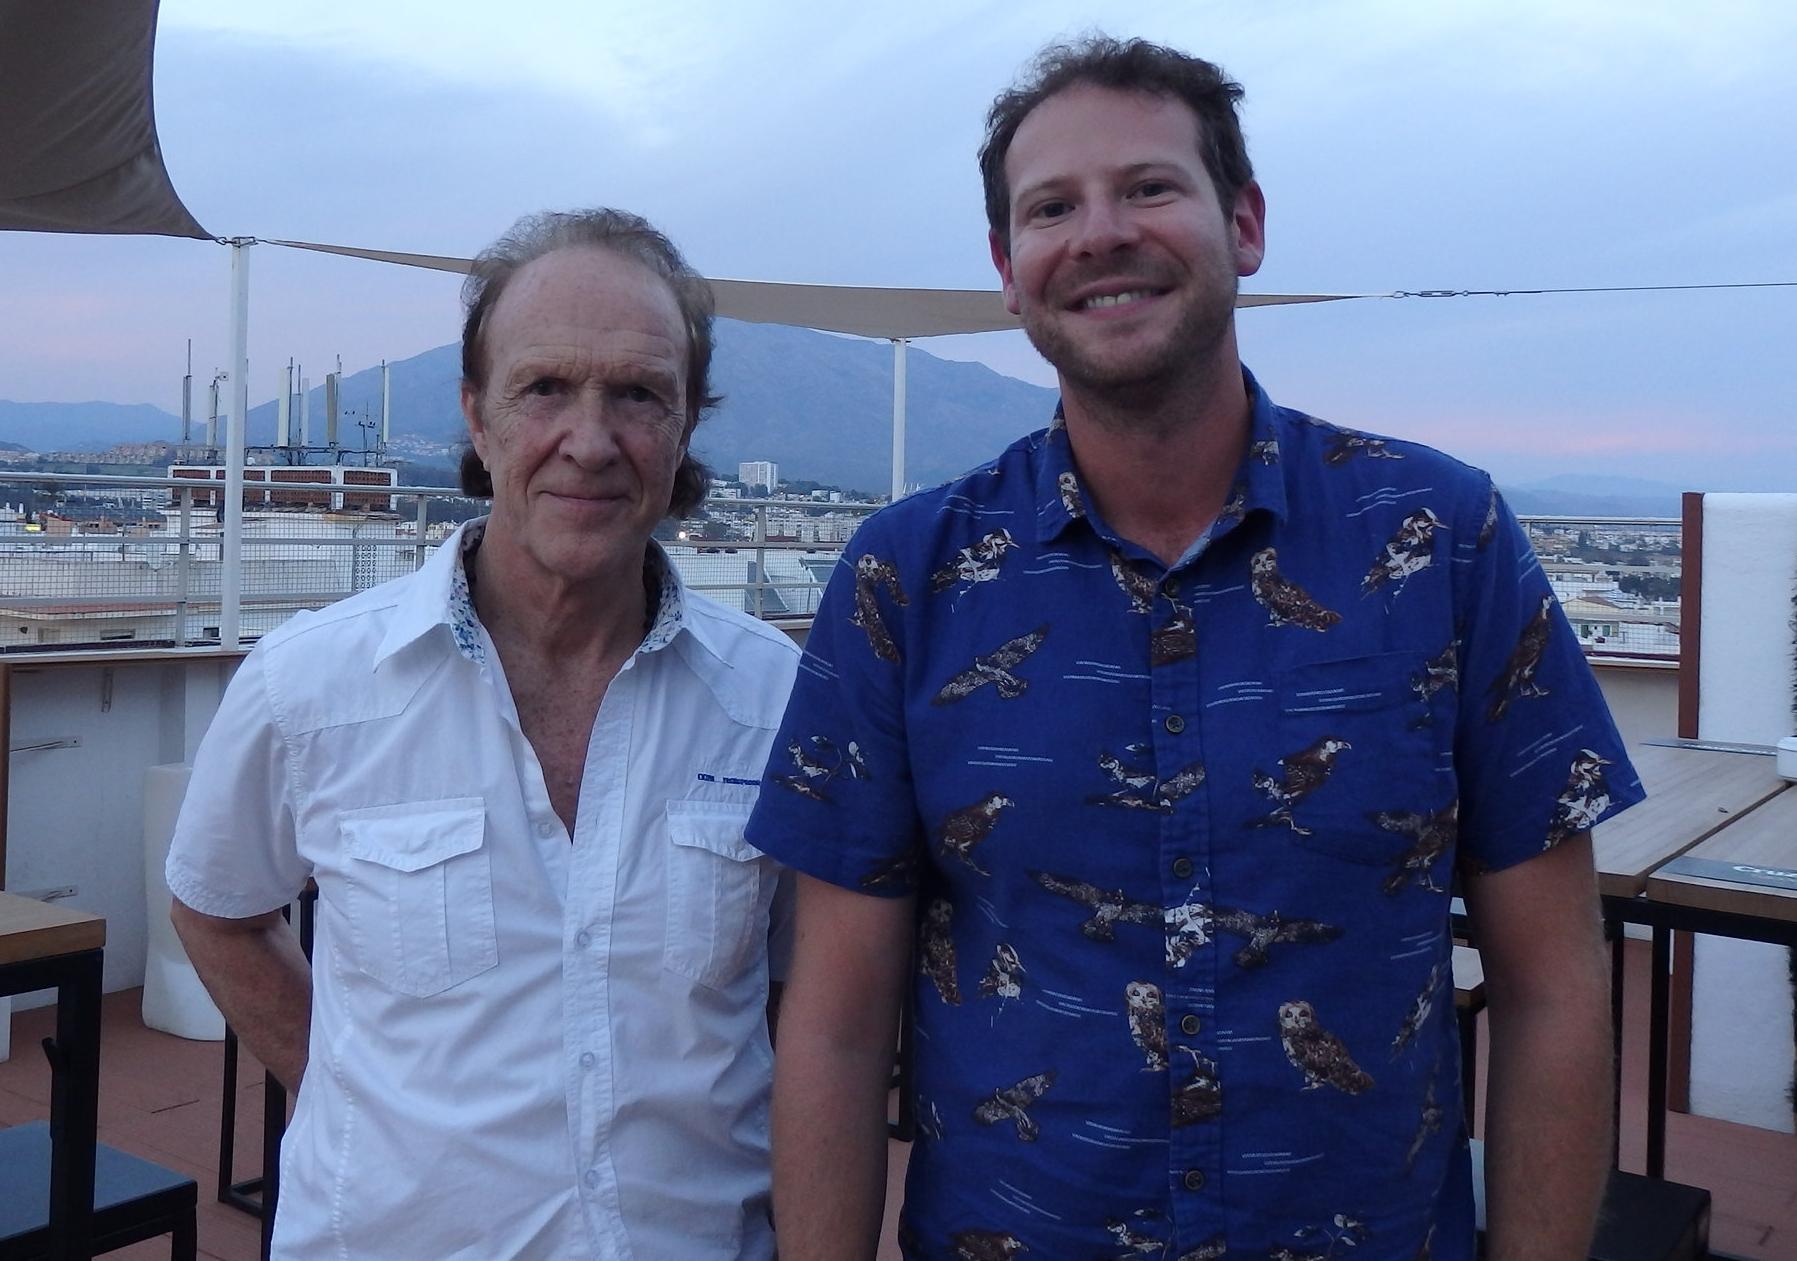 The 'buspass bull-fighter', Frank Evans, with Olly Mann